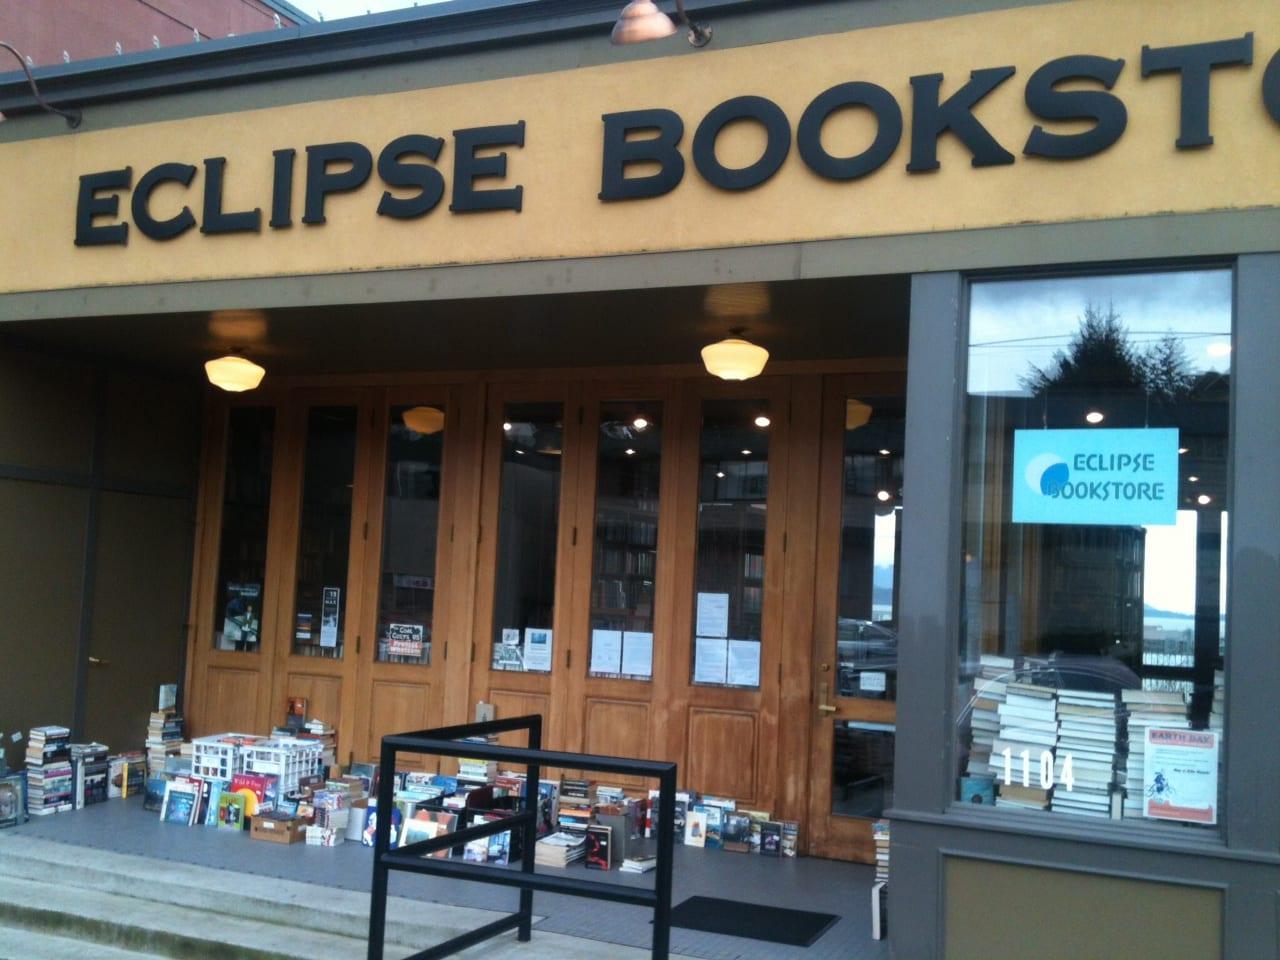 Eclipse exterior low res